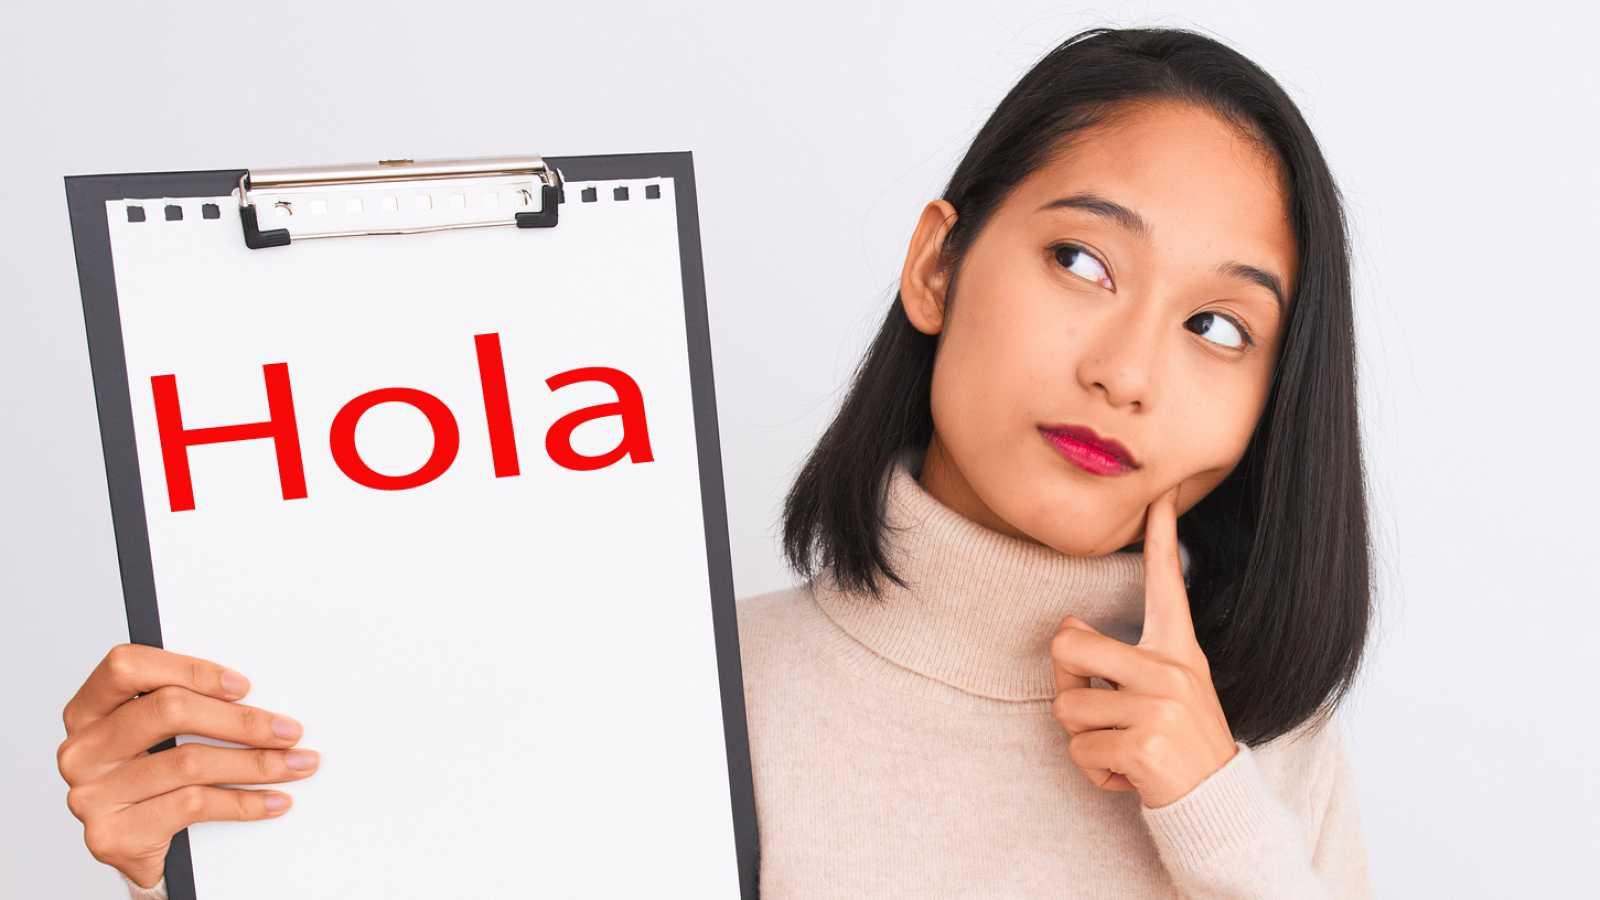 Asia hoy - El aprendizaje del español en China - 26/11/20 - escuchar ahora